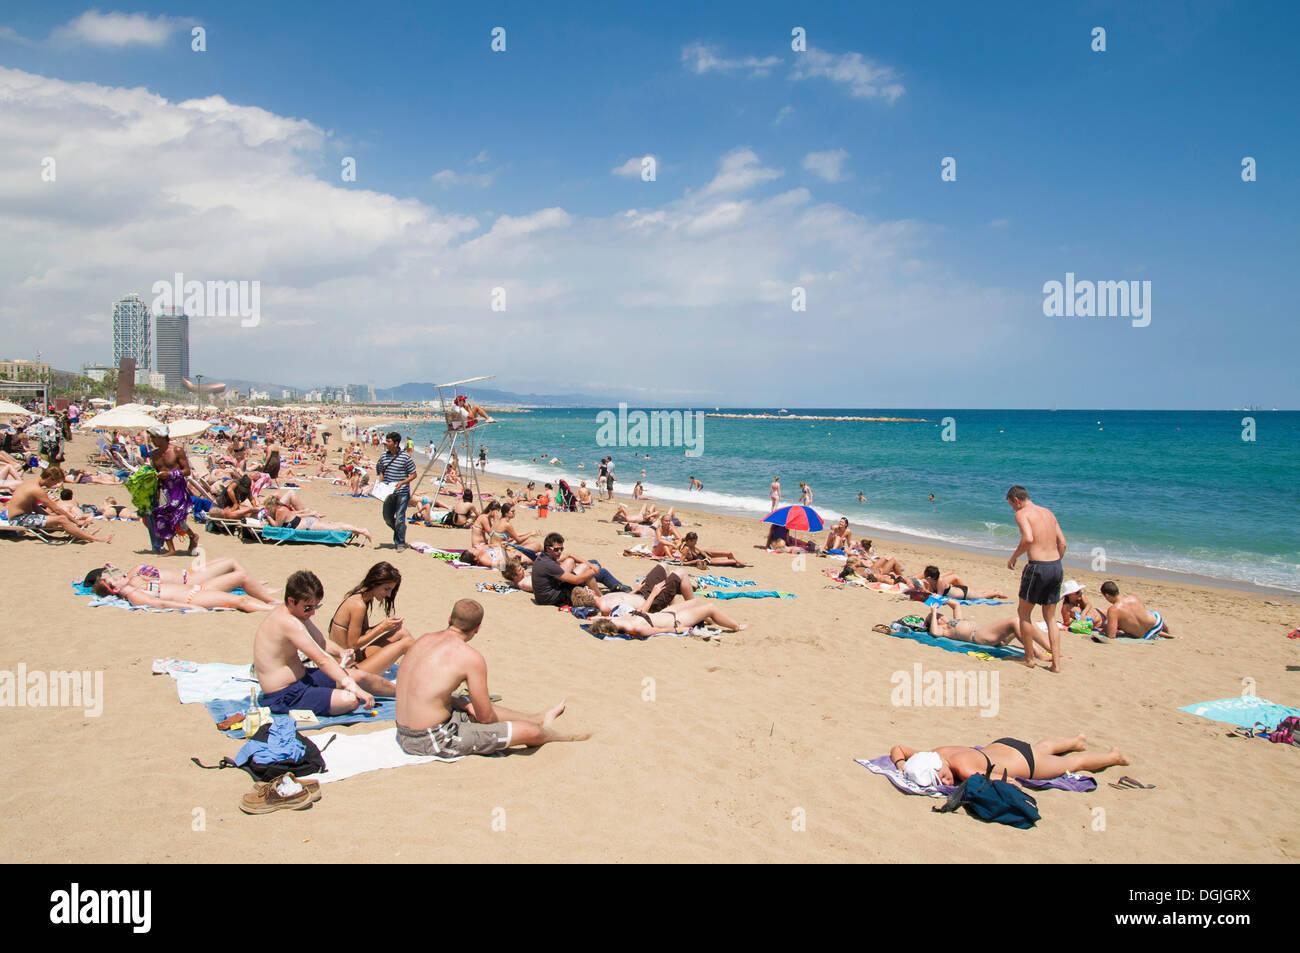 Strand Von Barcelona Katalonien Spanien Europa Stockfoto Bild